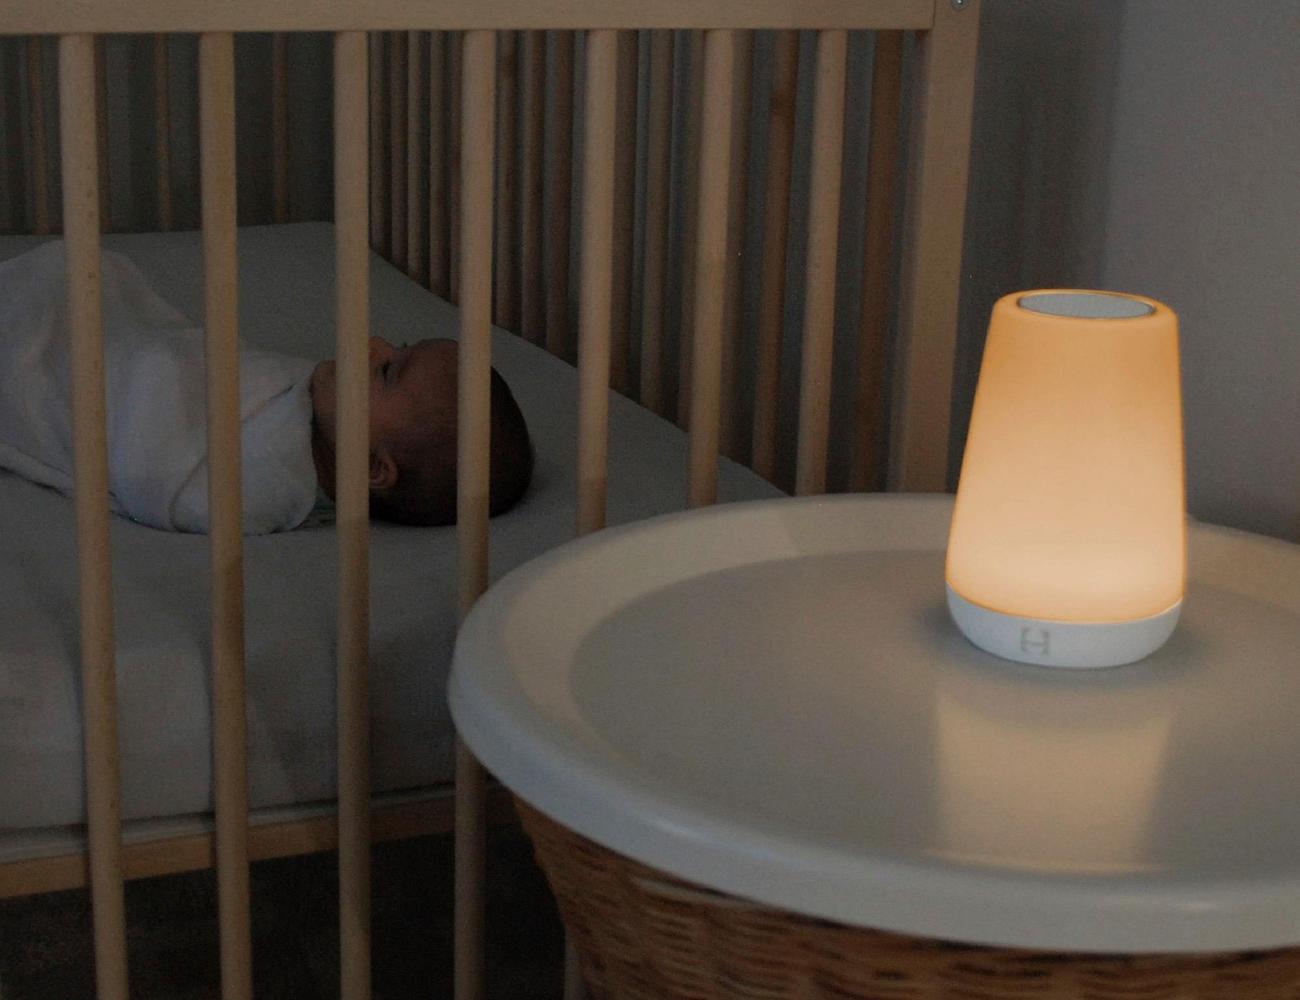 Hatch Baby Rest Kids' Night Light